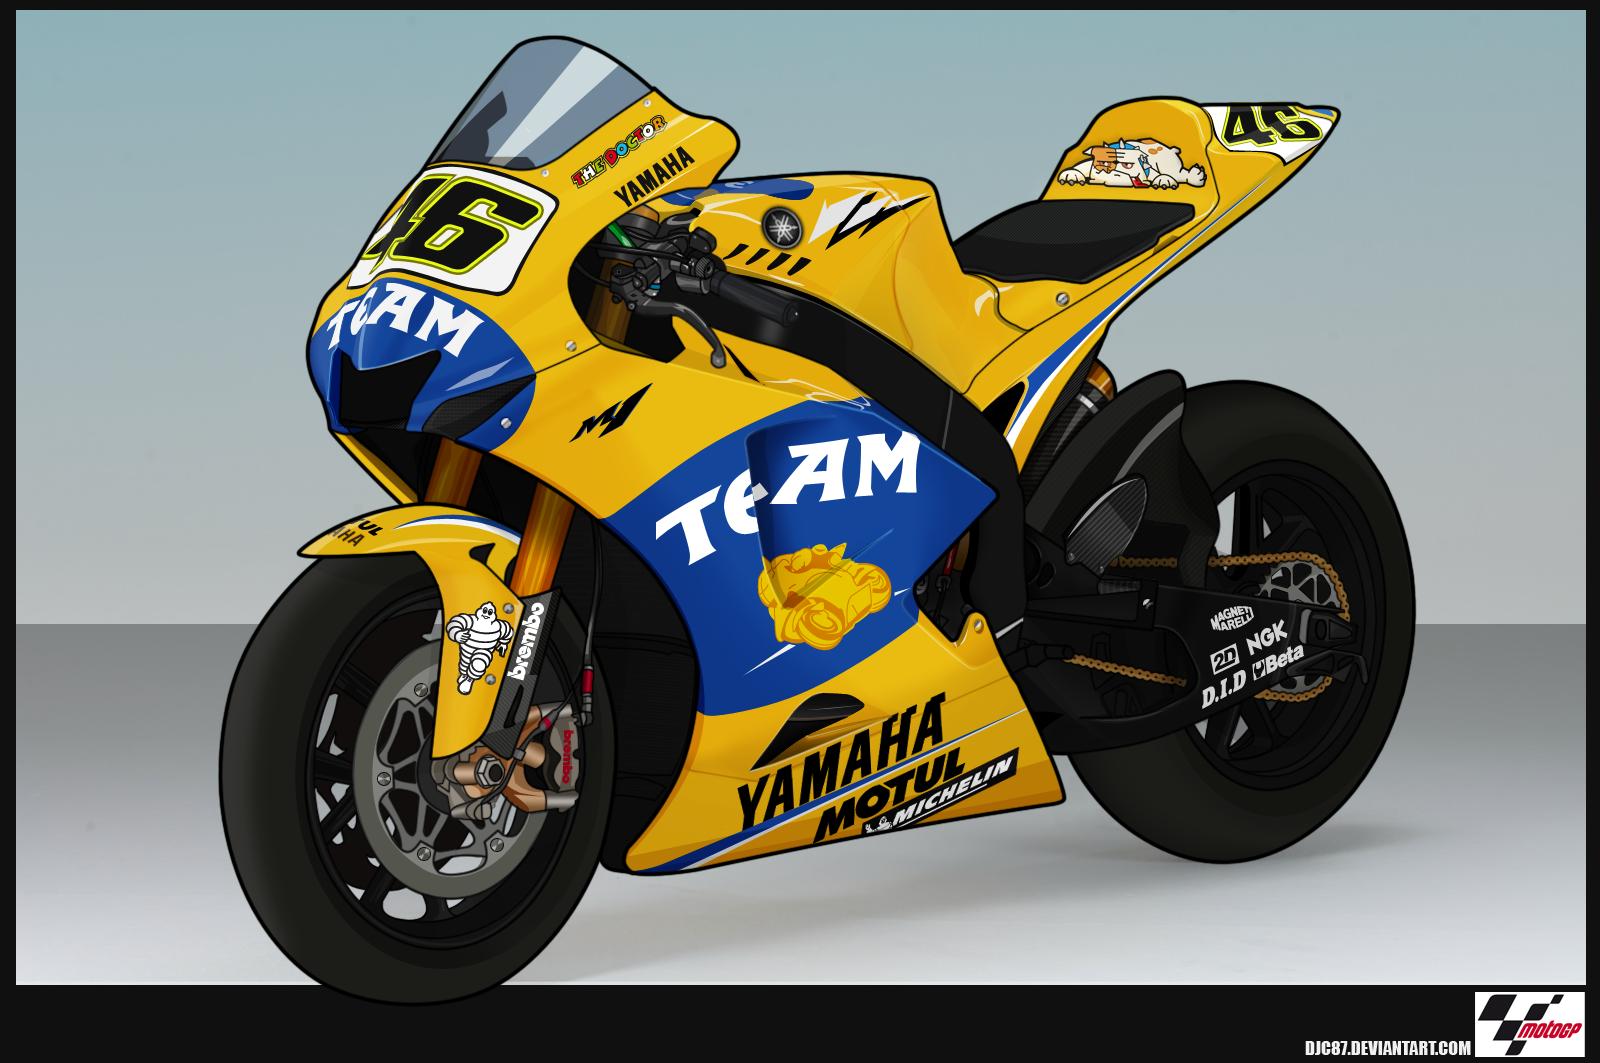 Yamaha M1 2006 Valentino Rossi by DJC87